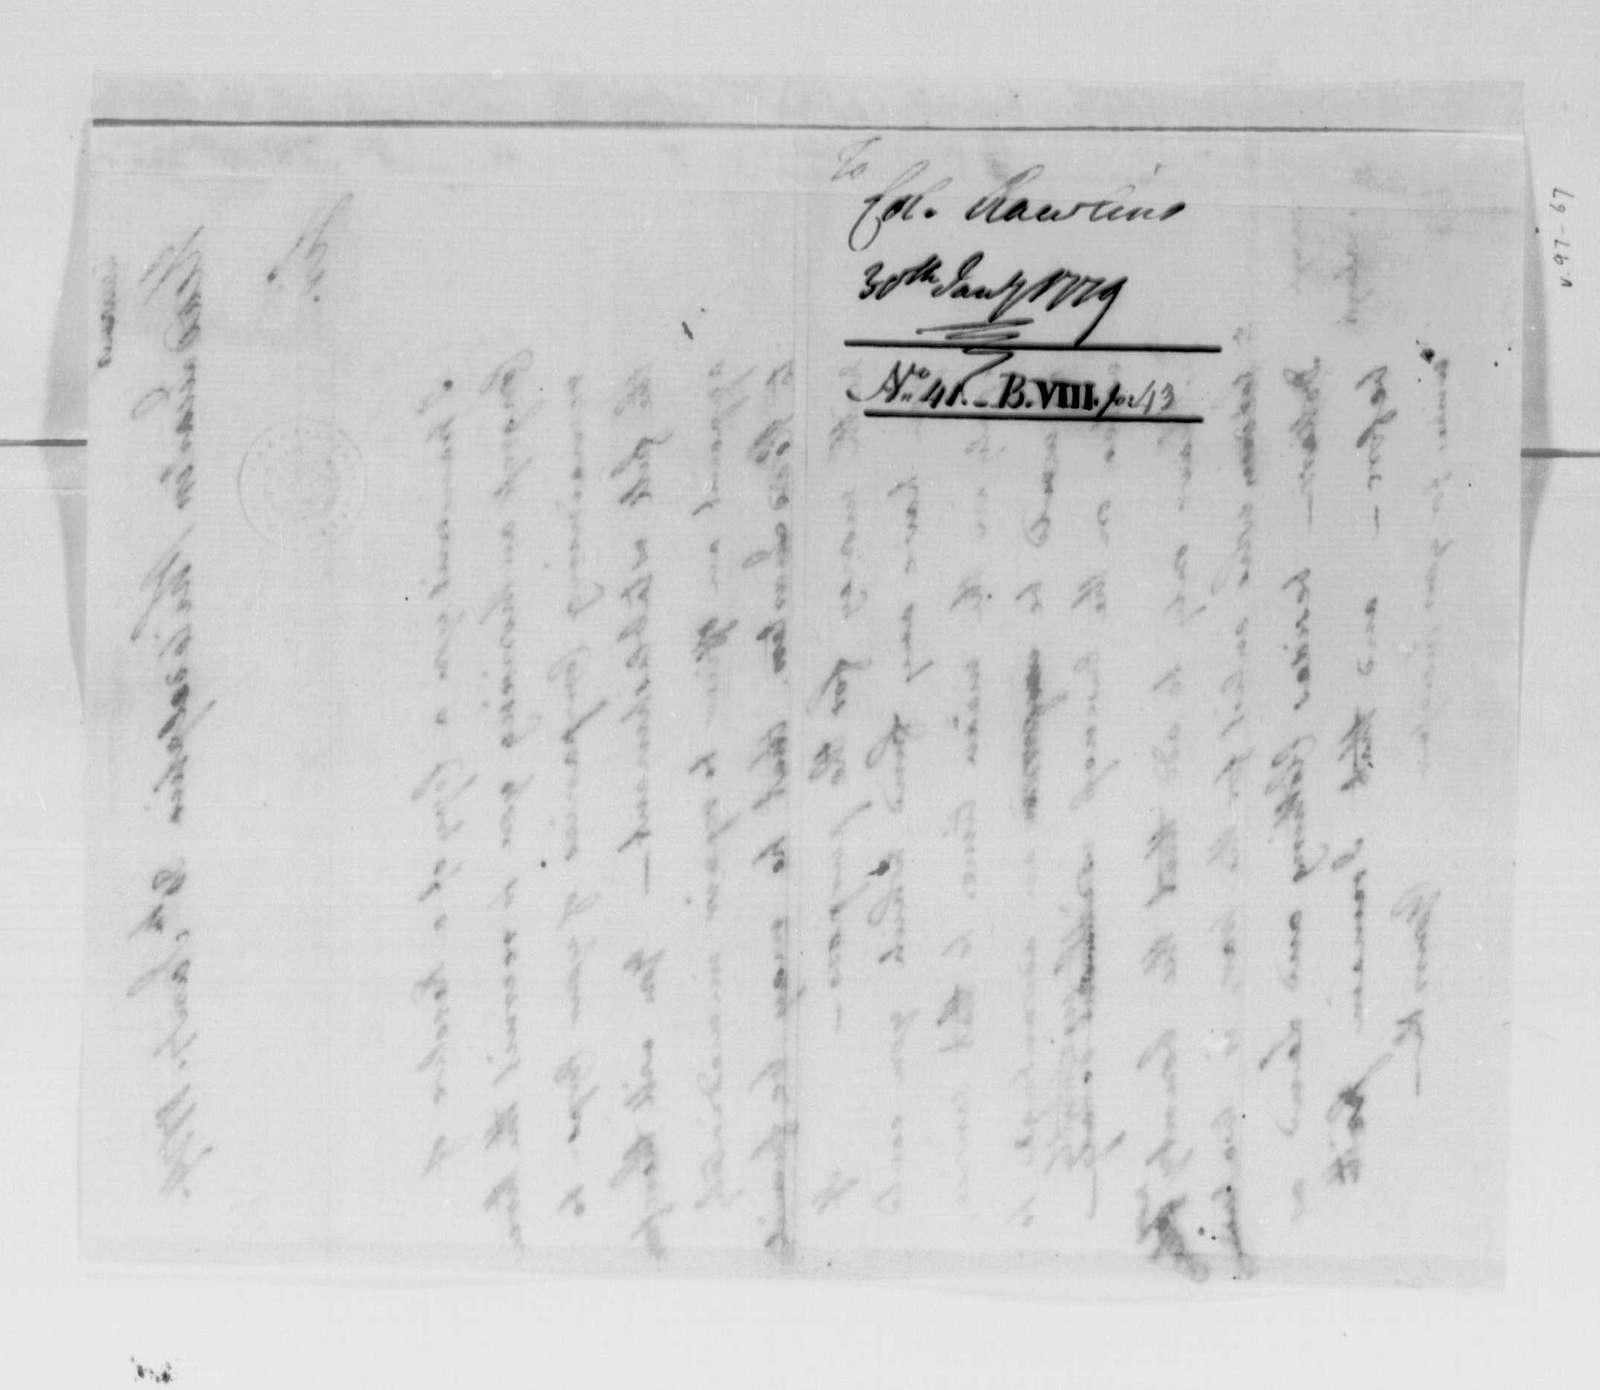 George Washington Papers, Series 4, General Correspondence: George Washington to Moses Rawlings, January 30, 1779